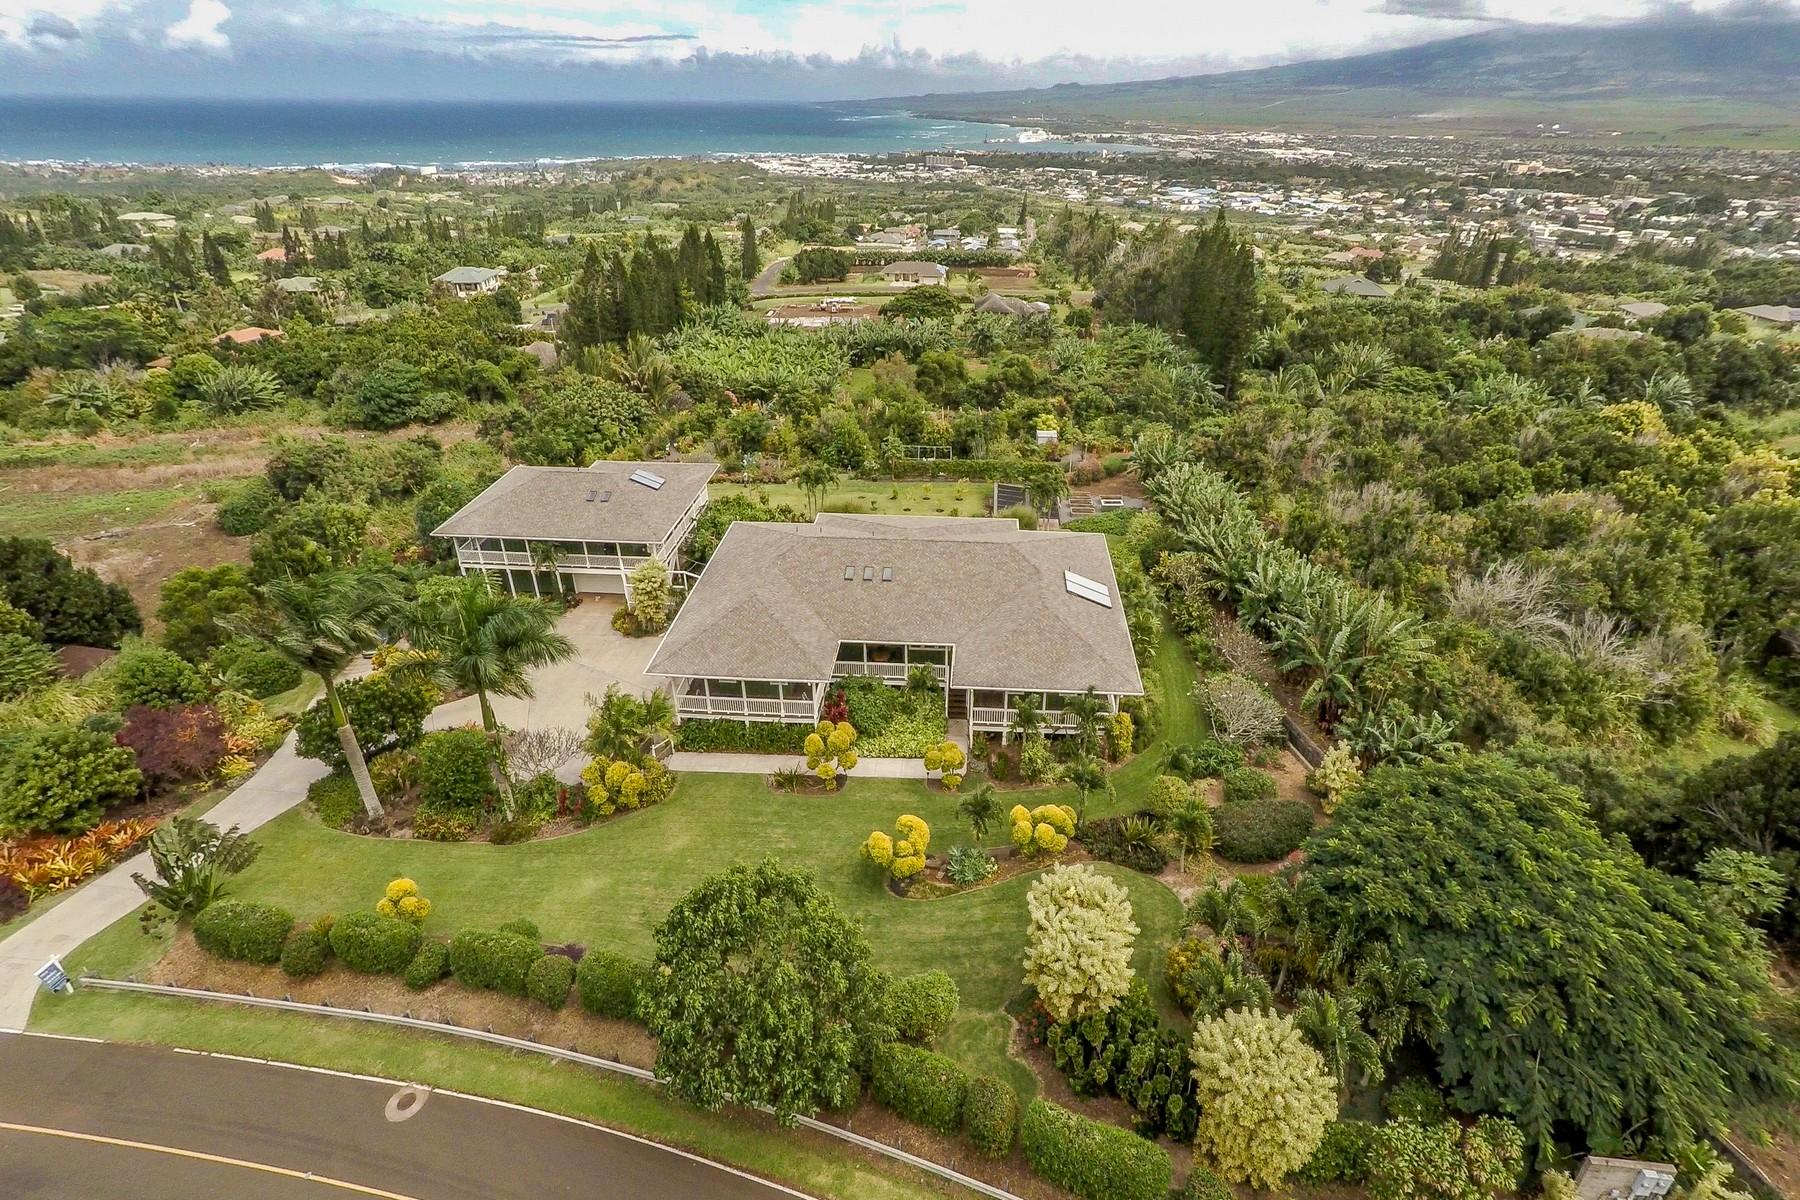 Single Family Home for Sale at Wailuku Plantation Style Home...Picturesque and Inviting 2451 Kamaile Street Wailuku, Hawaii 96793 United States